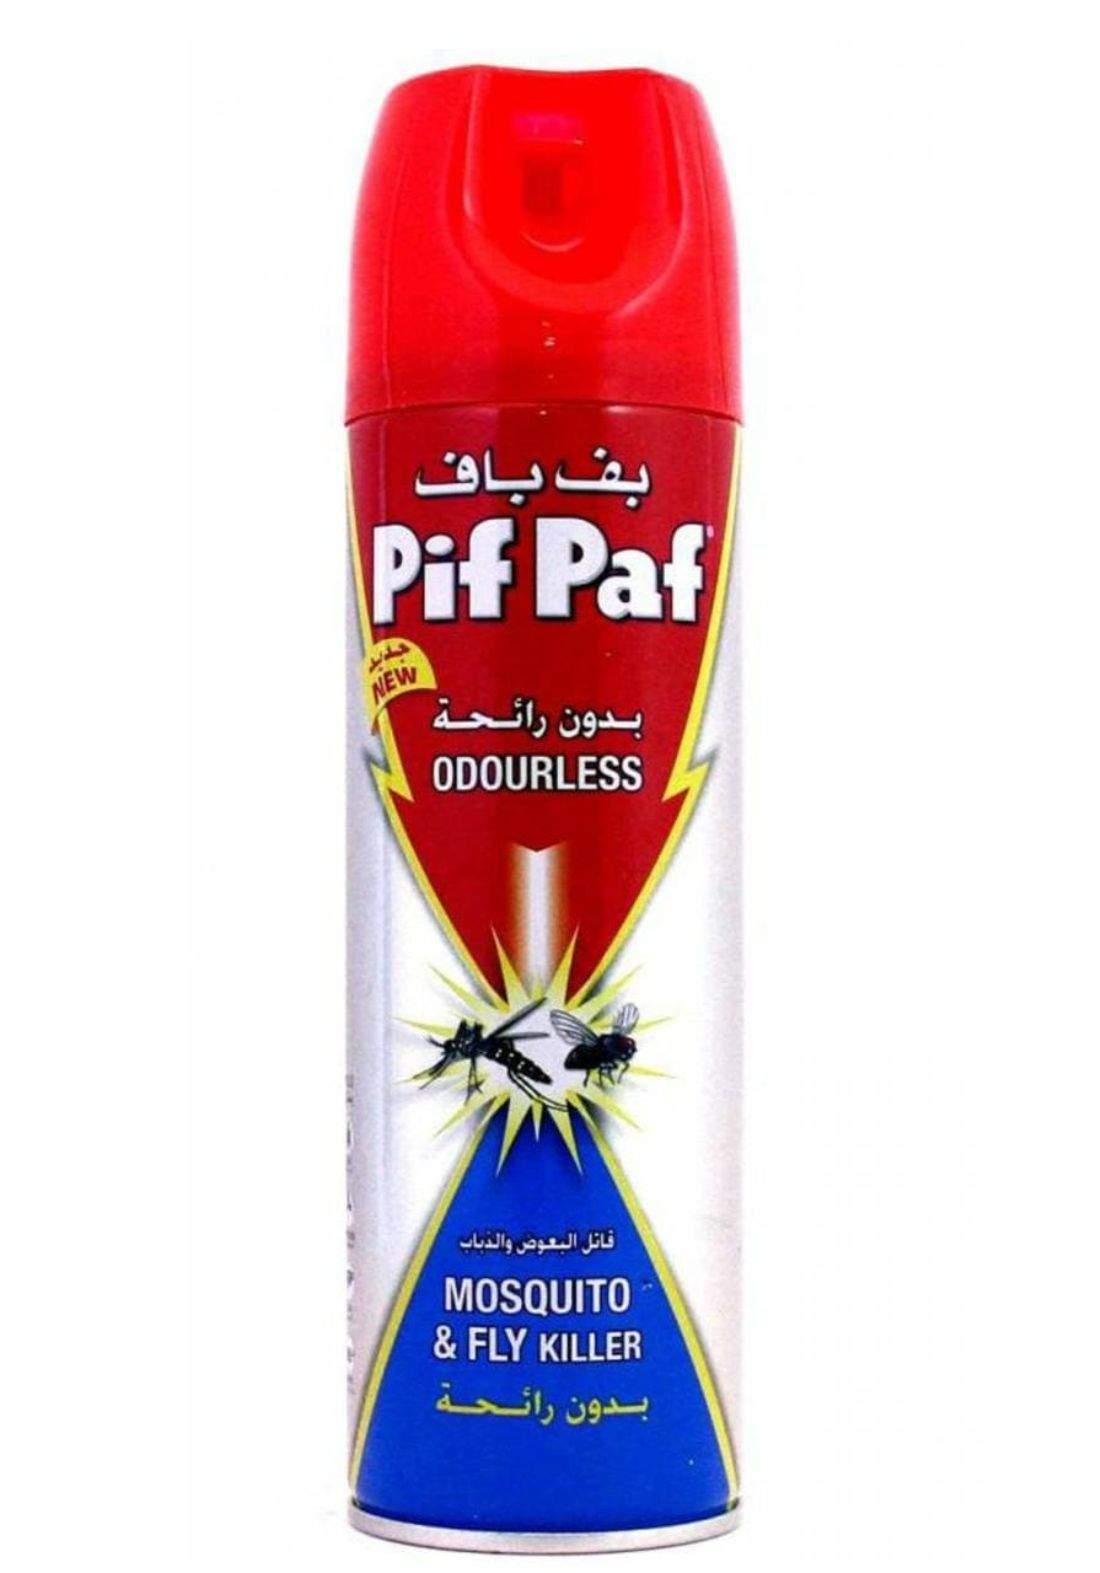 pif paf mosquito & fly killer 300ml بف باف قاتل البعوض والذباب